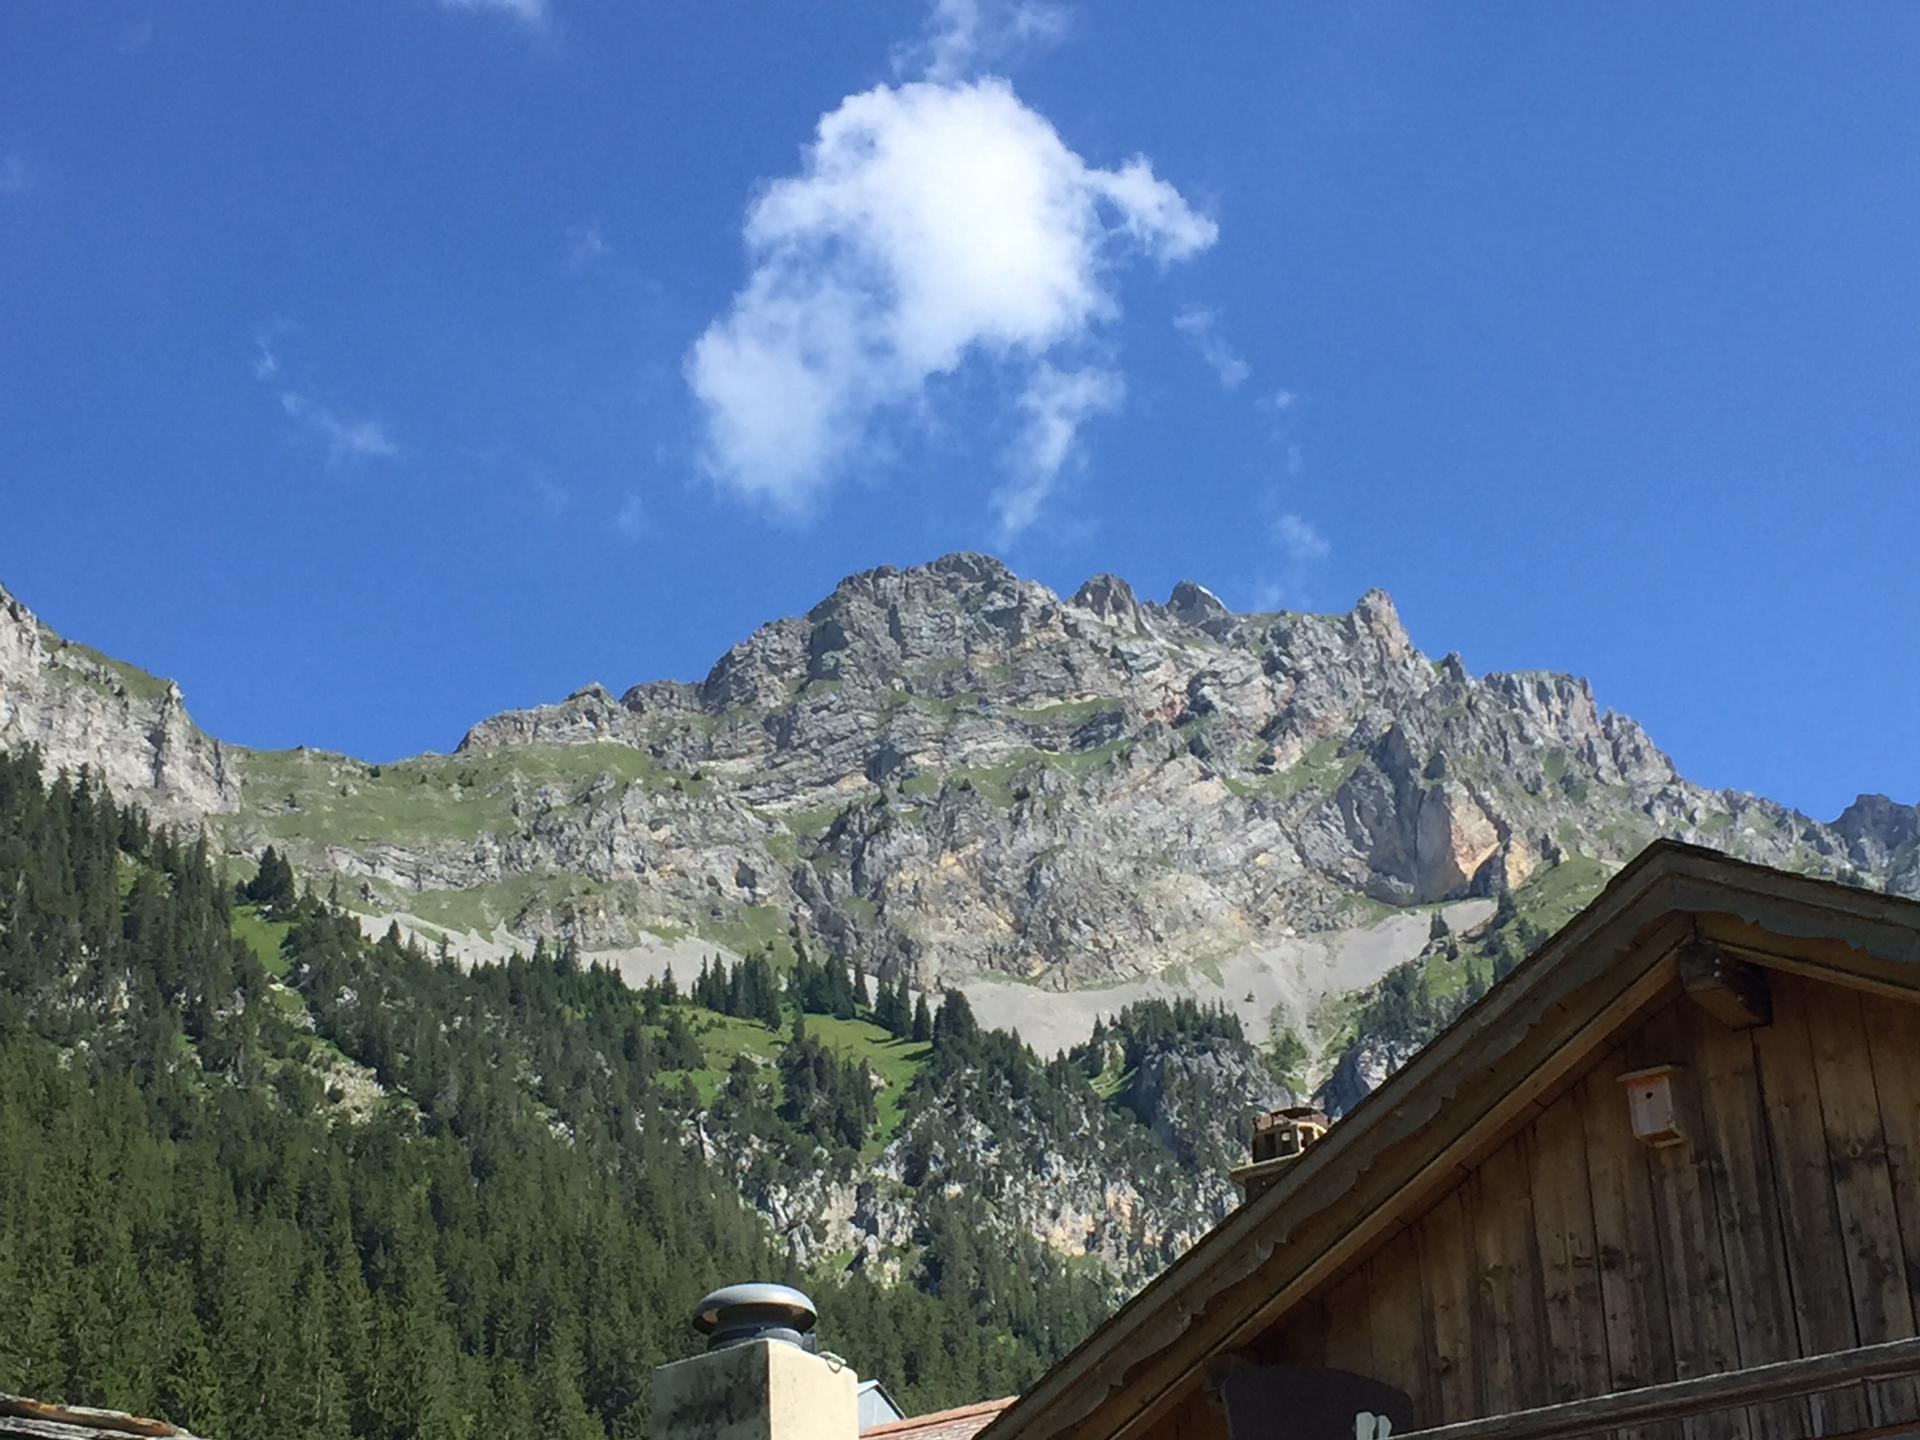 Appartement de vacances Beryll # 2 6-Bett-Wohnung (2022117), Lenk im Simmental, Vallée de la Simme, Oberland bernois, Suisse, image 4